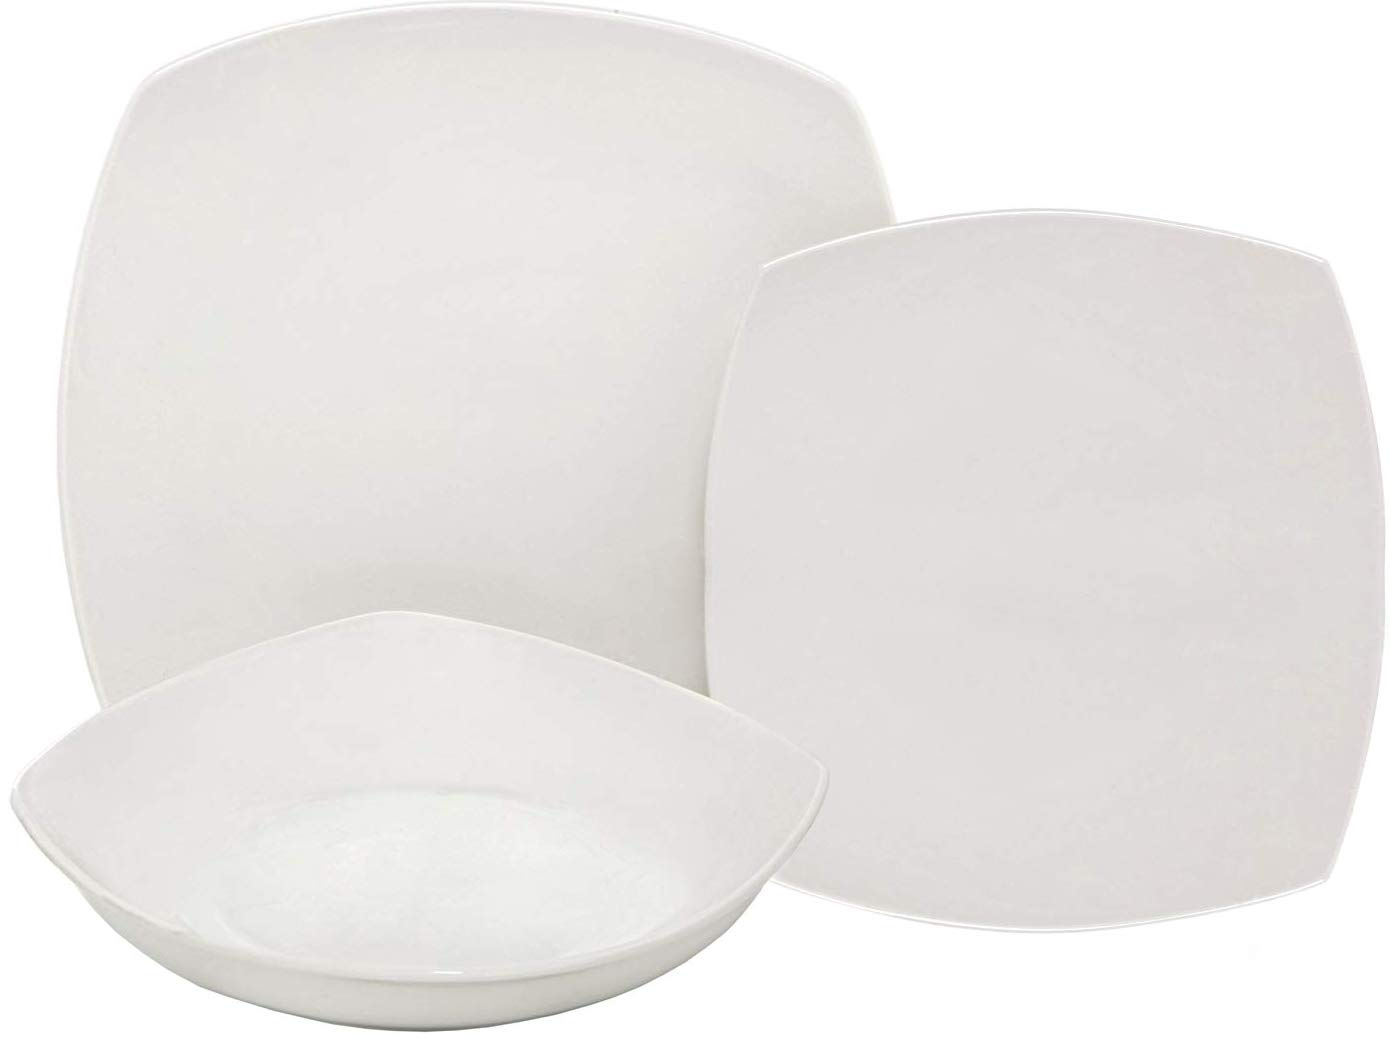 Melange 18-Piece Square Porcelain Dinnerware Set (White) | Service for 6 | Microwave, Dishwasher & Oven Safe | Dinner Plate, Salad Plate, Soup Bowl (6 Each)